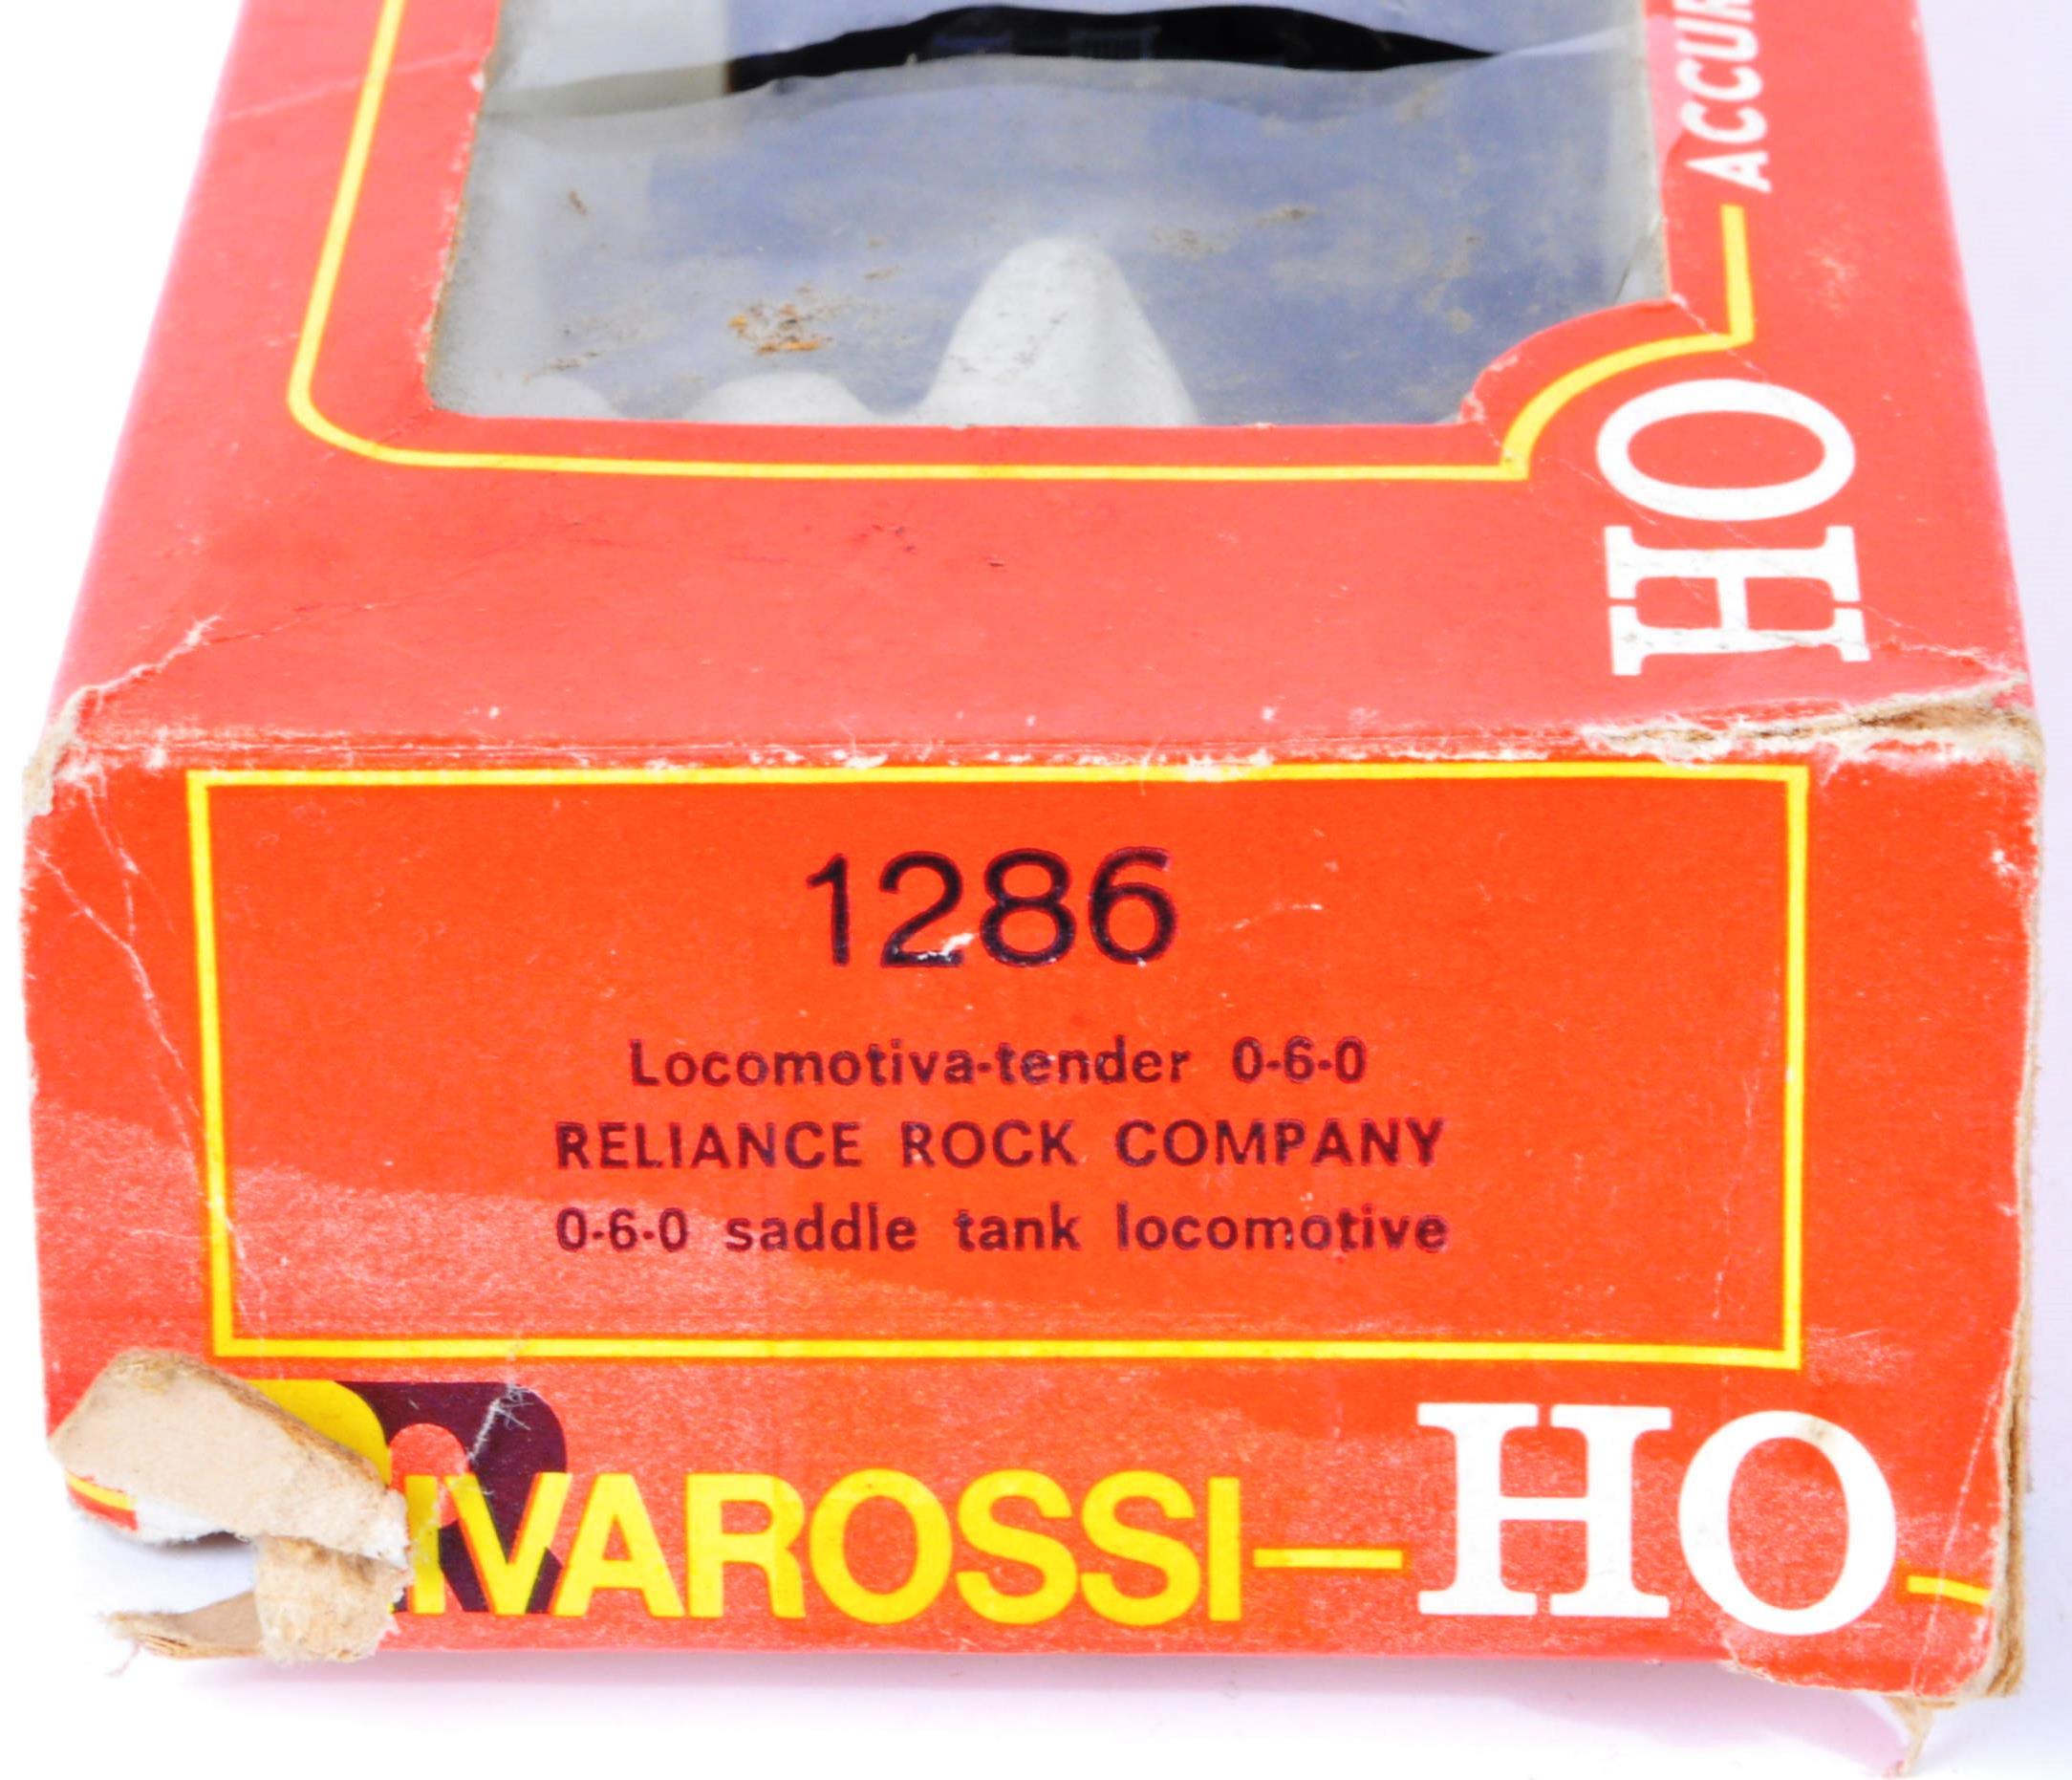 TWO RIVAROSSI HO / OO GAUGE MODEL RAILWAY LOCOMOTIVE ENGINES - Image 3 of 5